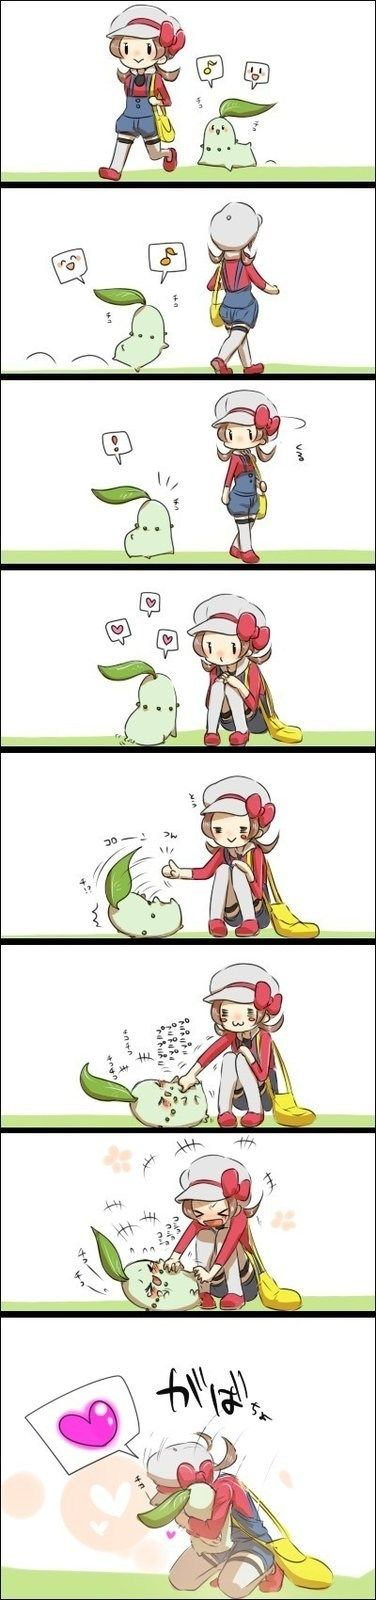 Pokémon love